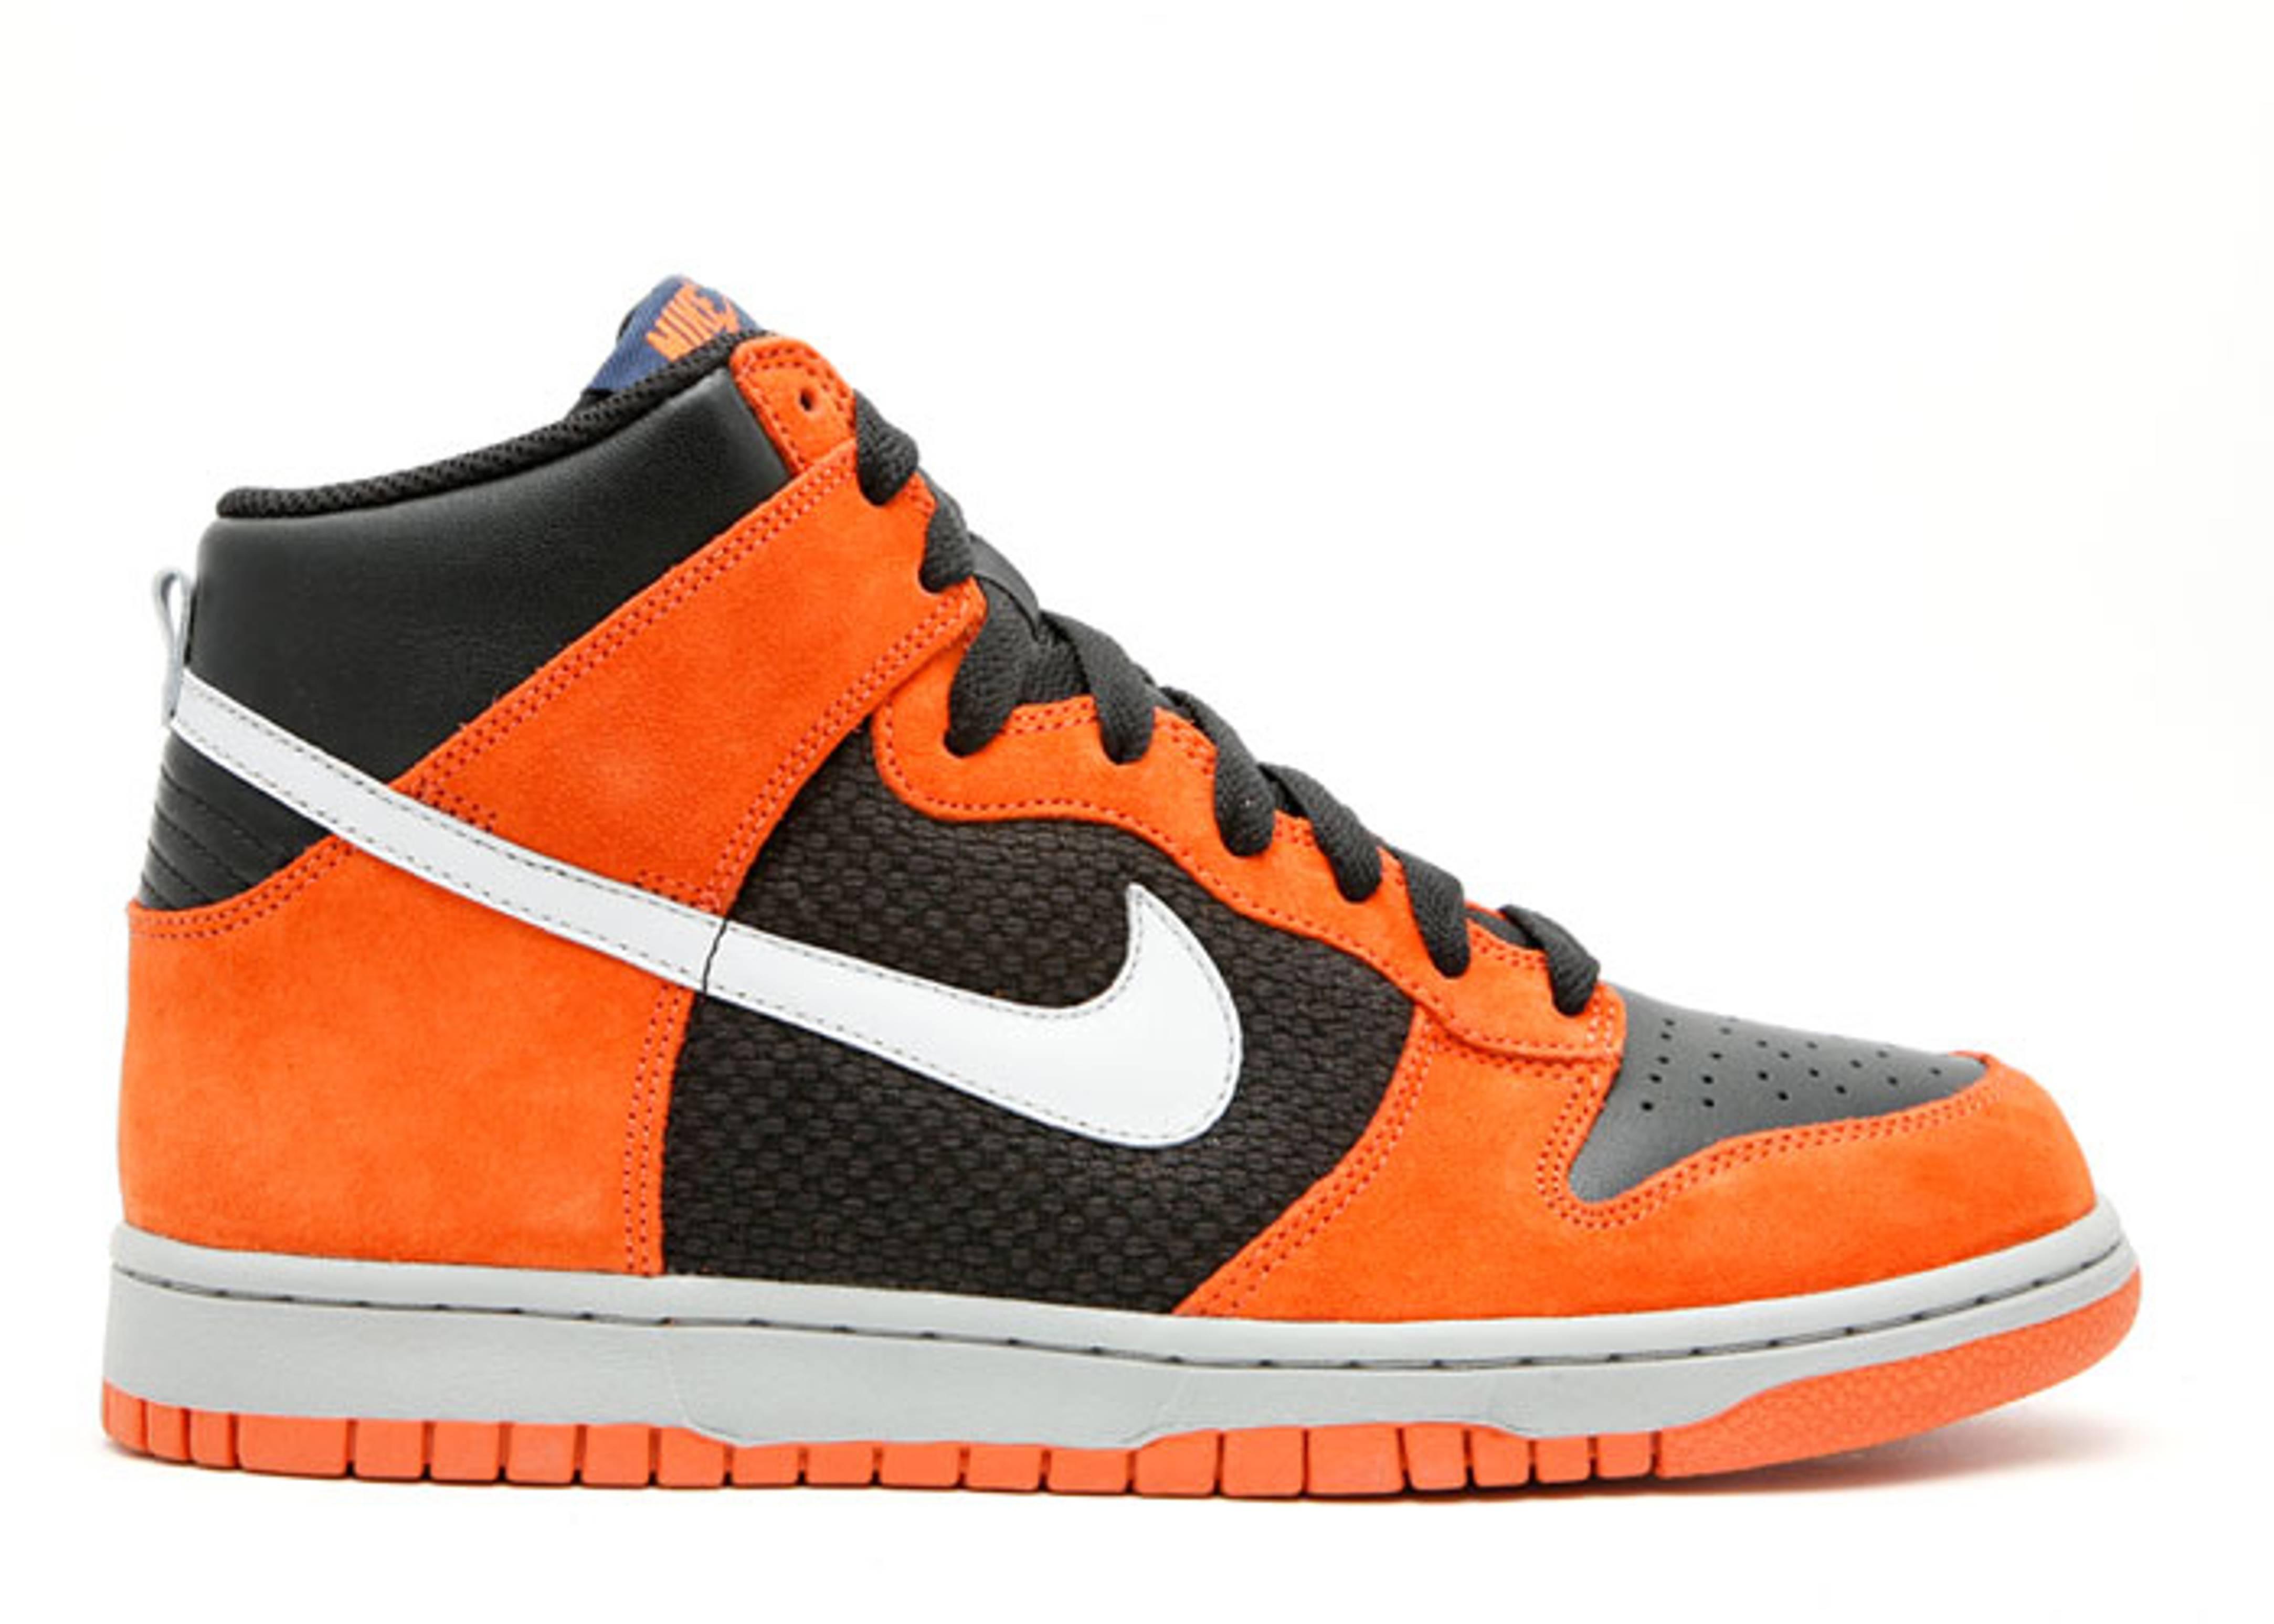 sneakers for cheap a81a7 0d5d2 Dunk High - Nike - 317982 001 - blackneutral grey-hoop orange  Flight Club